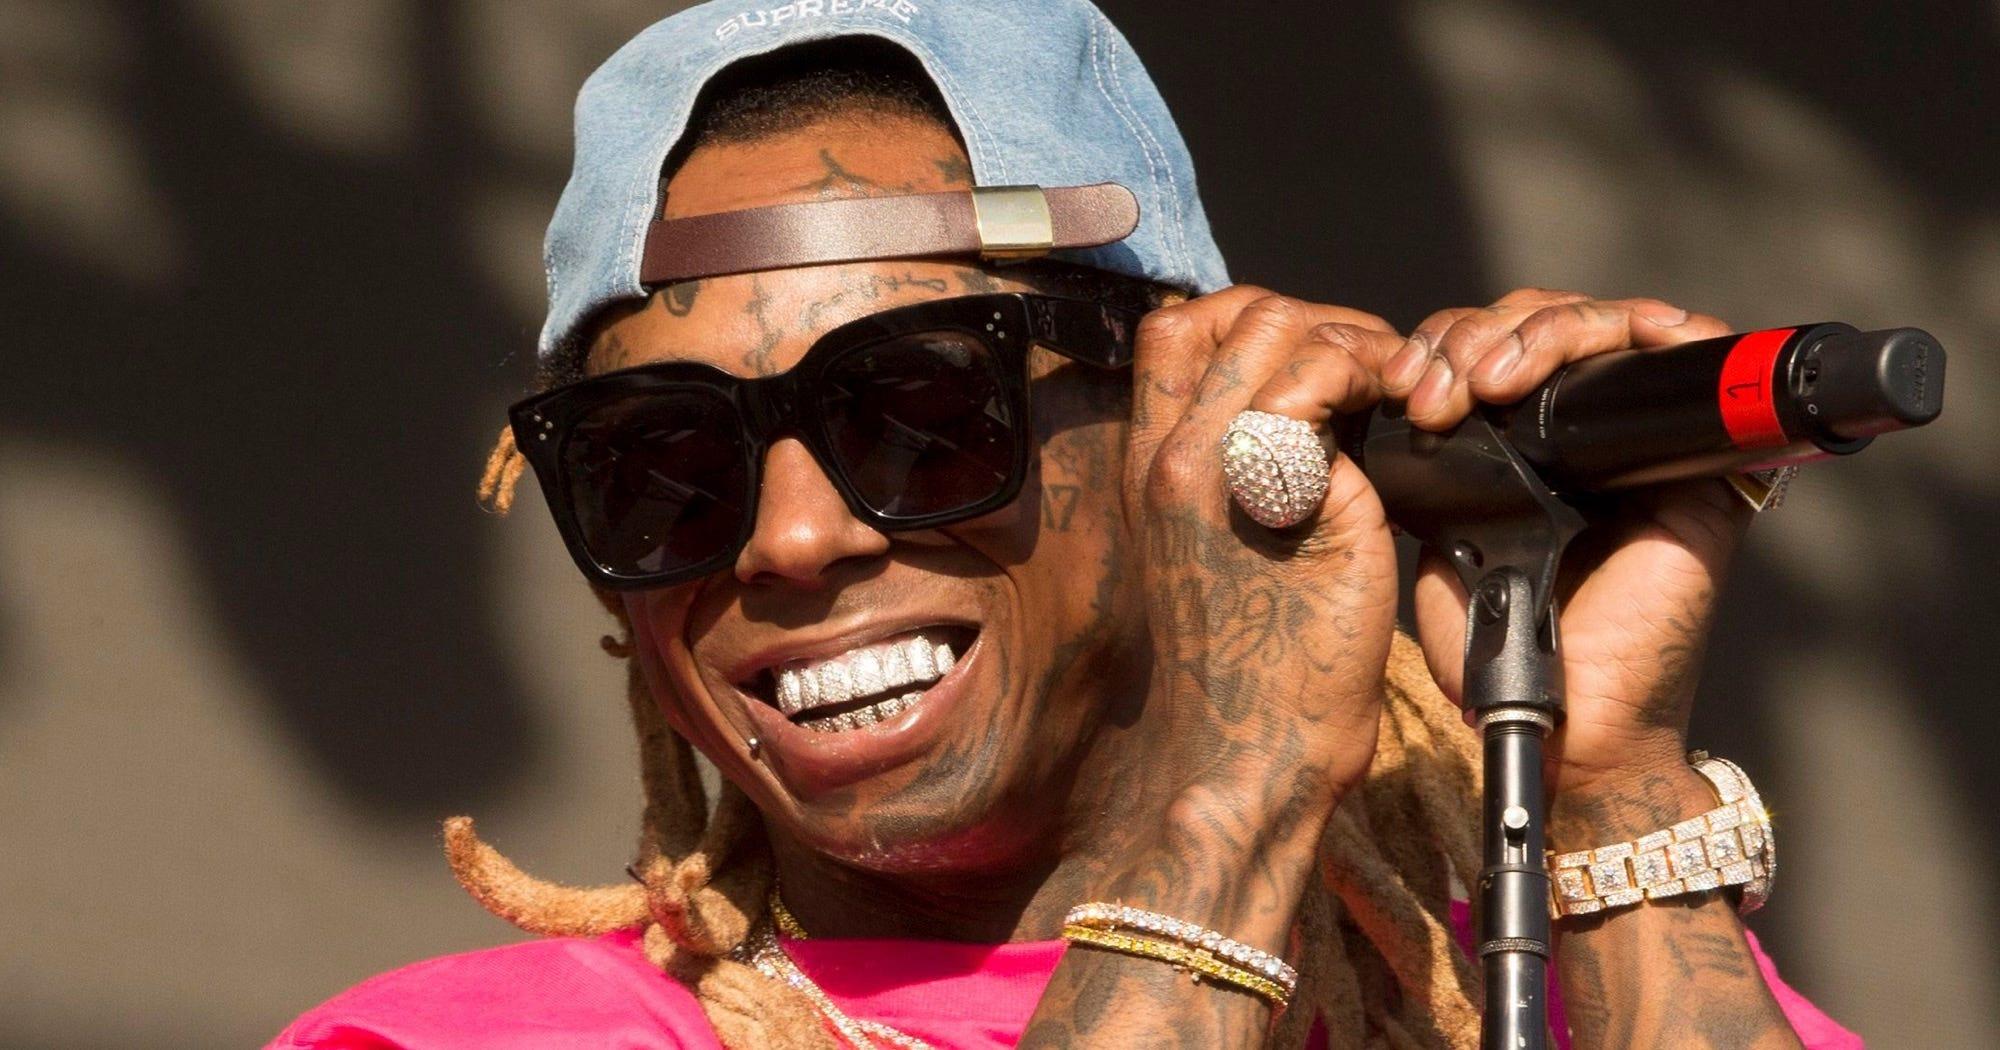 Lil Wayne Sucking Dick